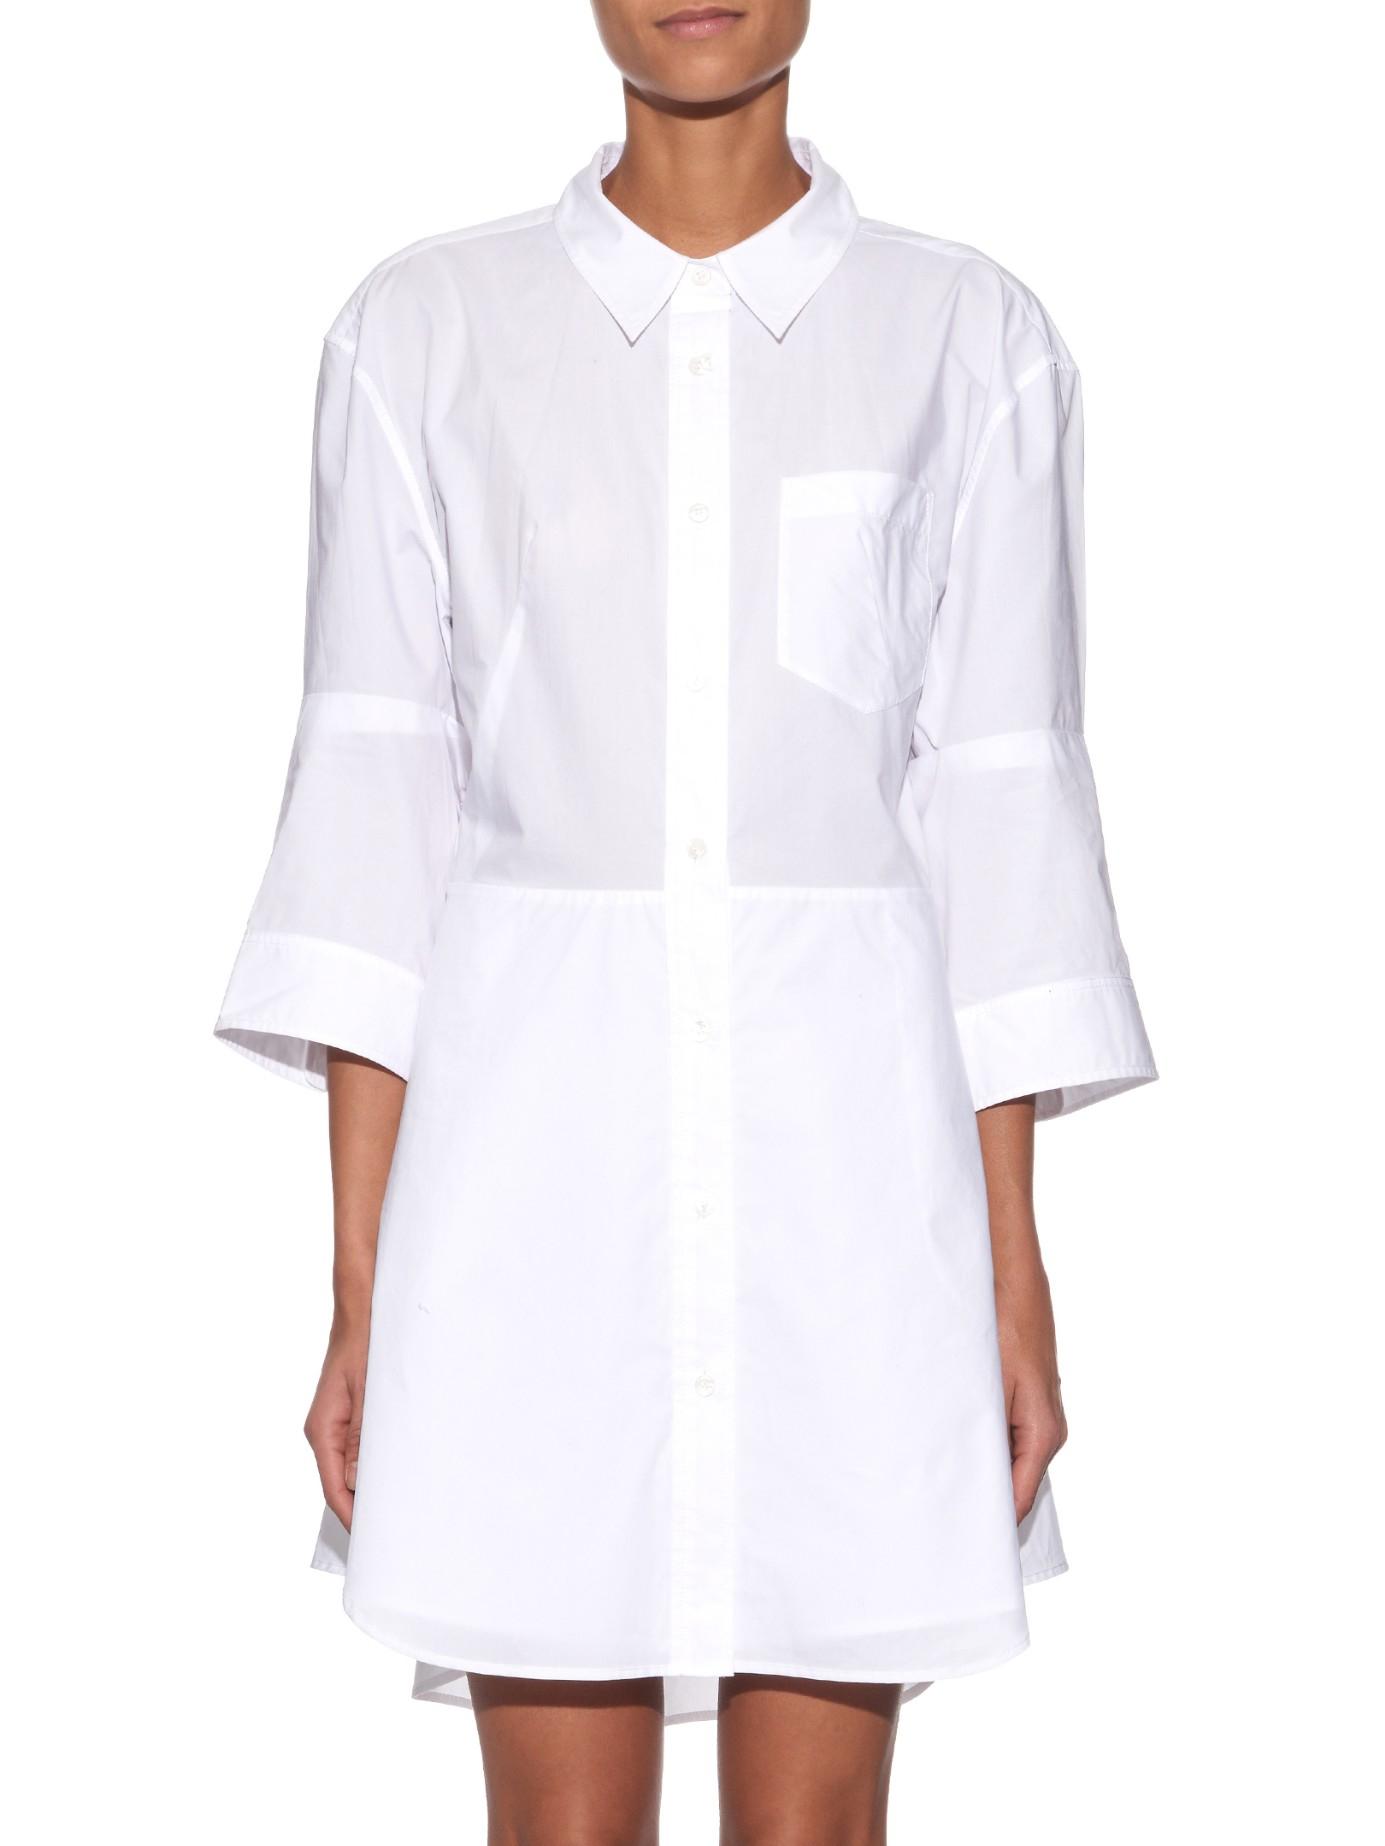 Acne Dee Tech Pop Cotton Shirt Dress in White | Lyst